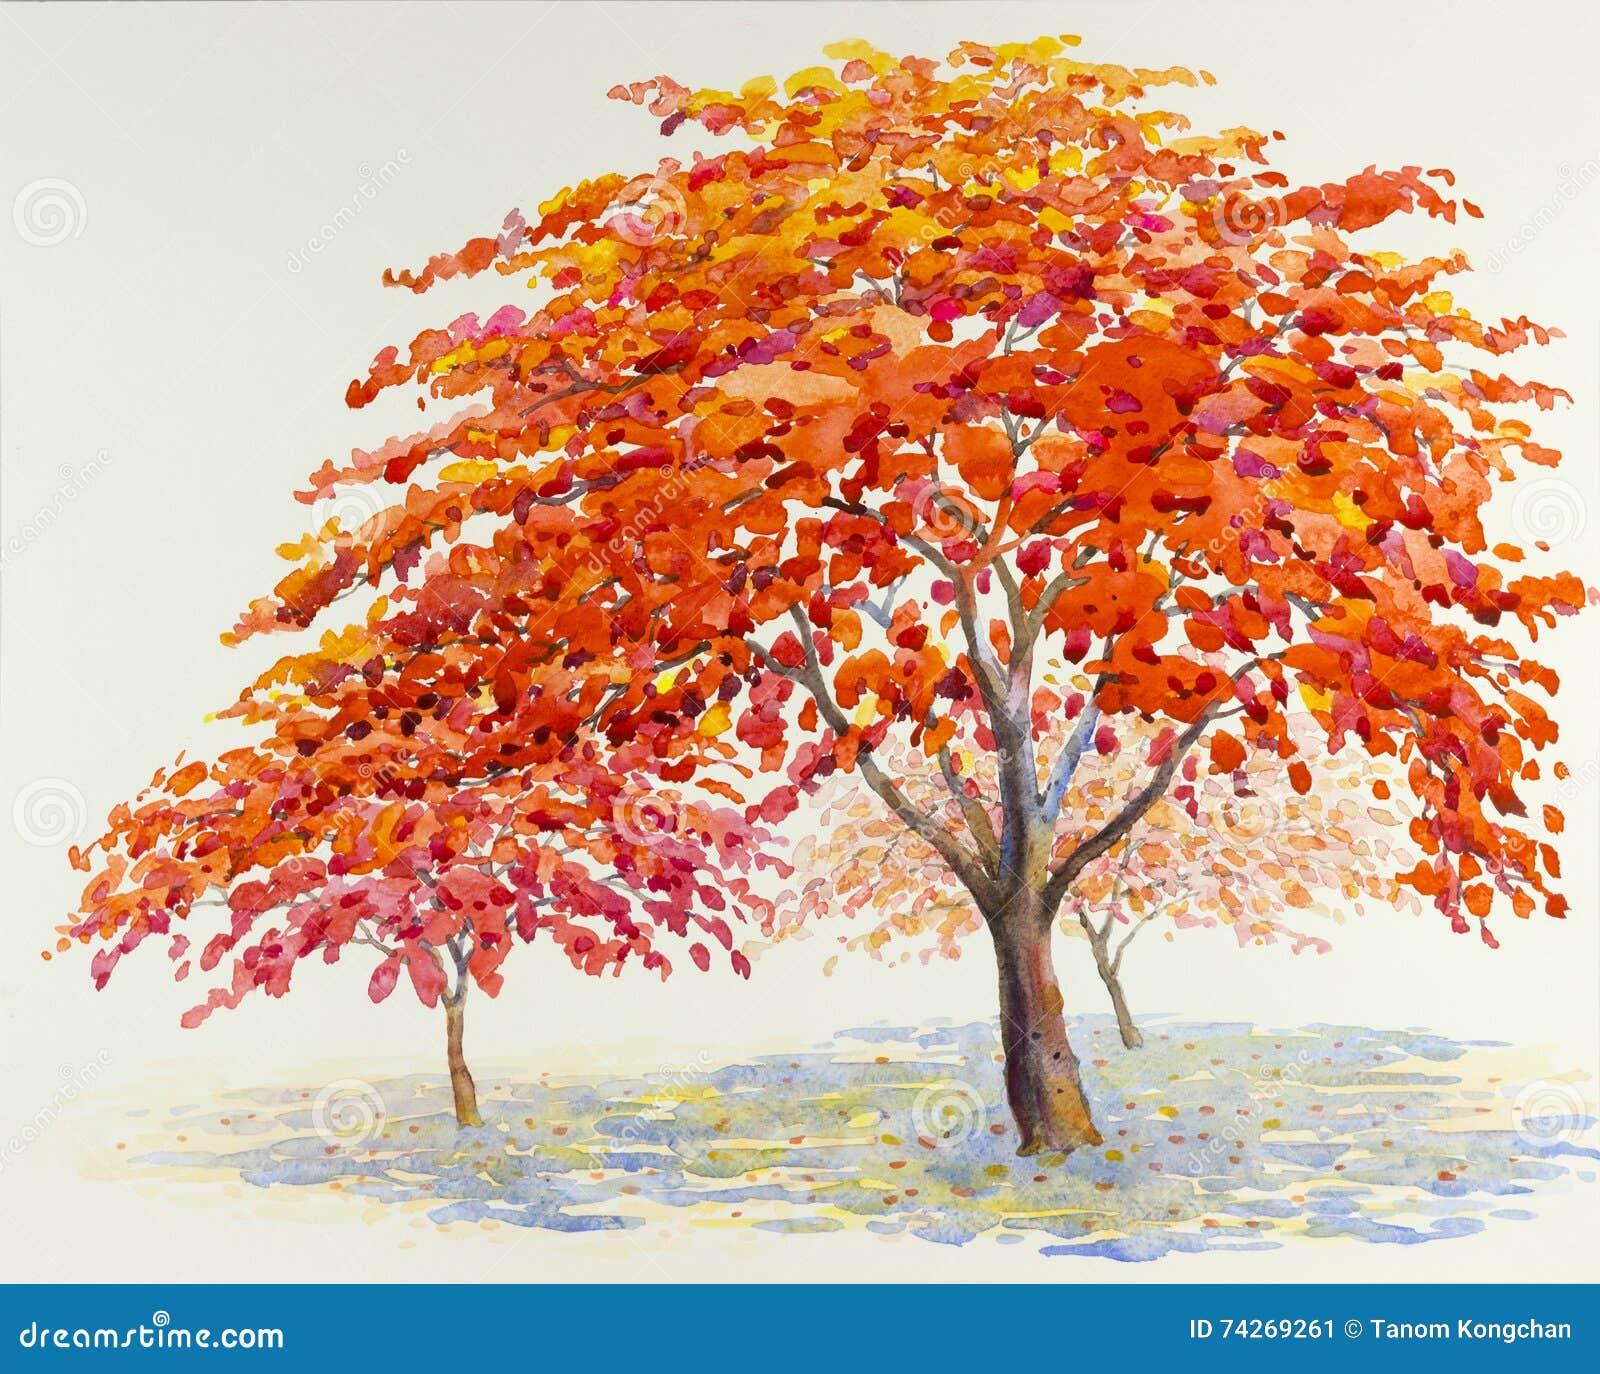 Watercolor Original Landscape Painting Red Orange Color